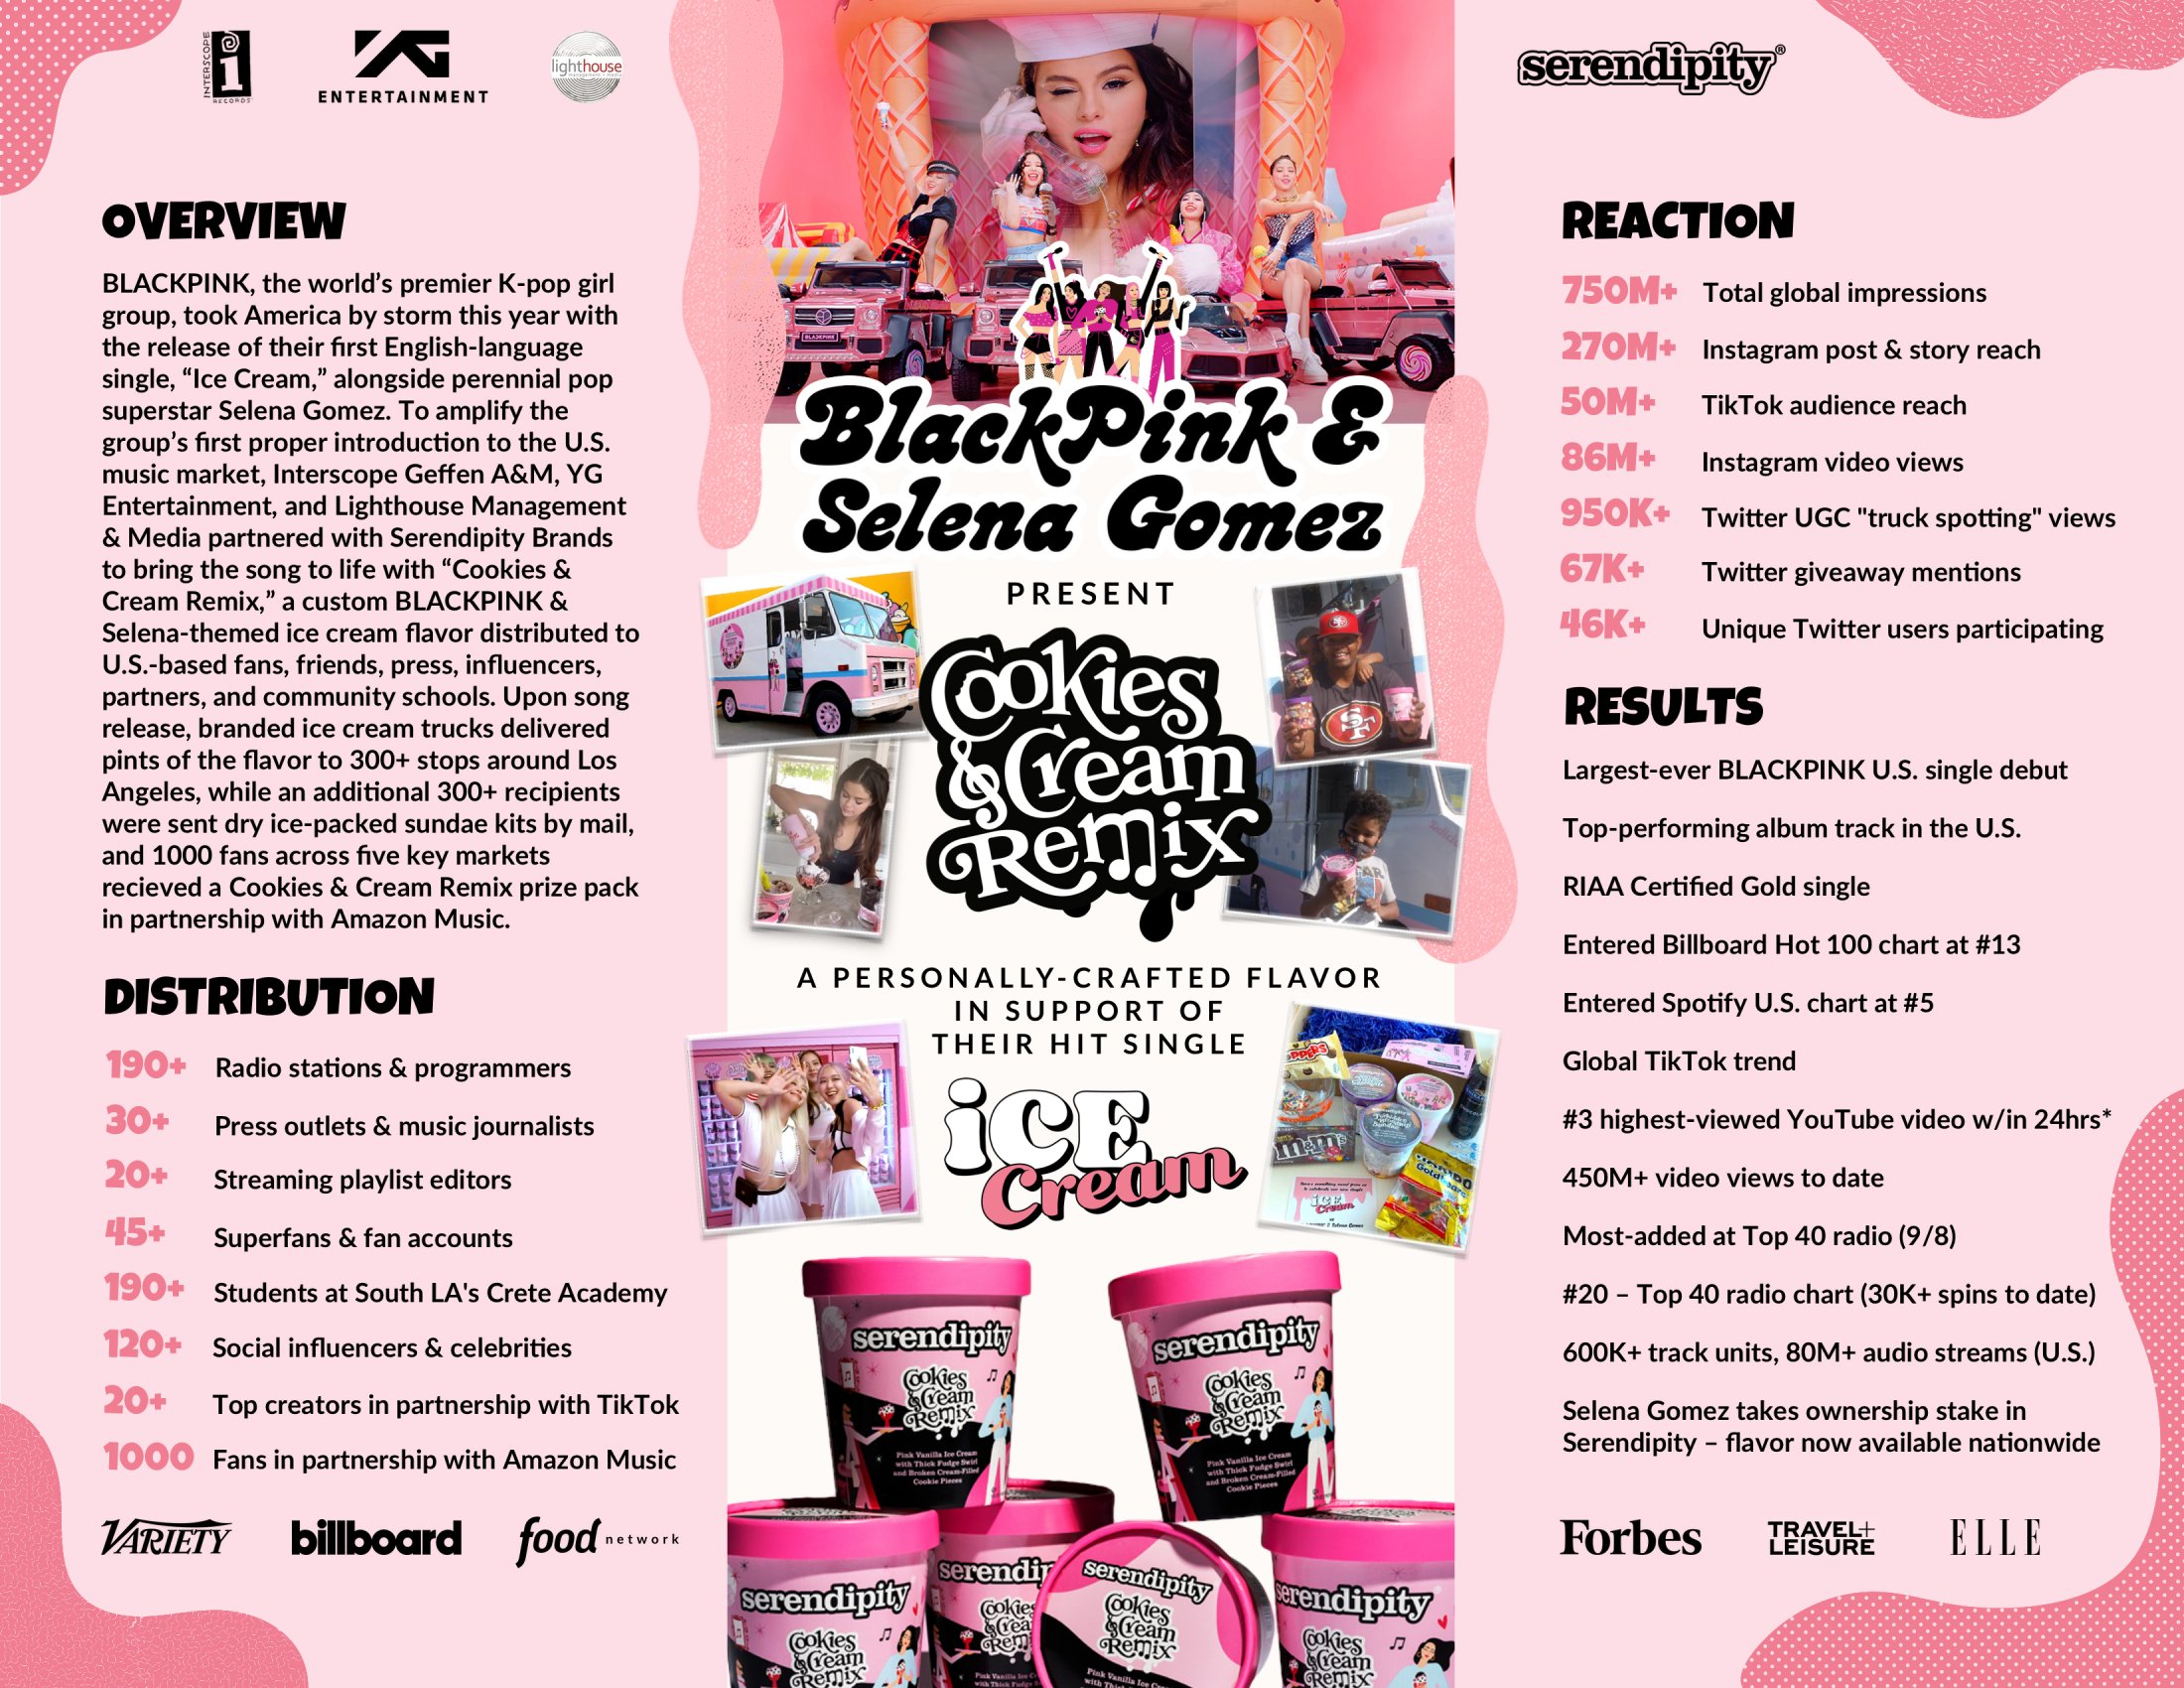 Thumbnail for BLACKPINK & Selena Gomez –